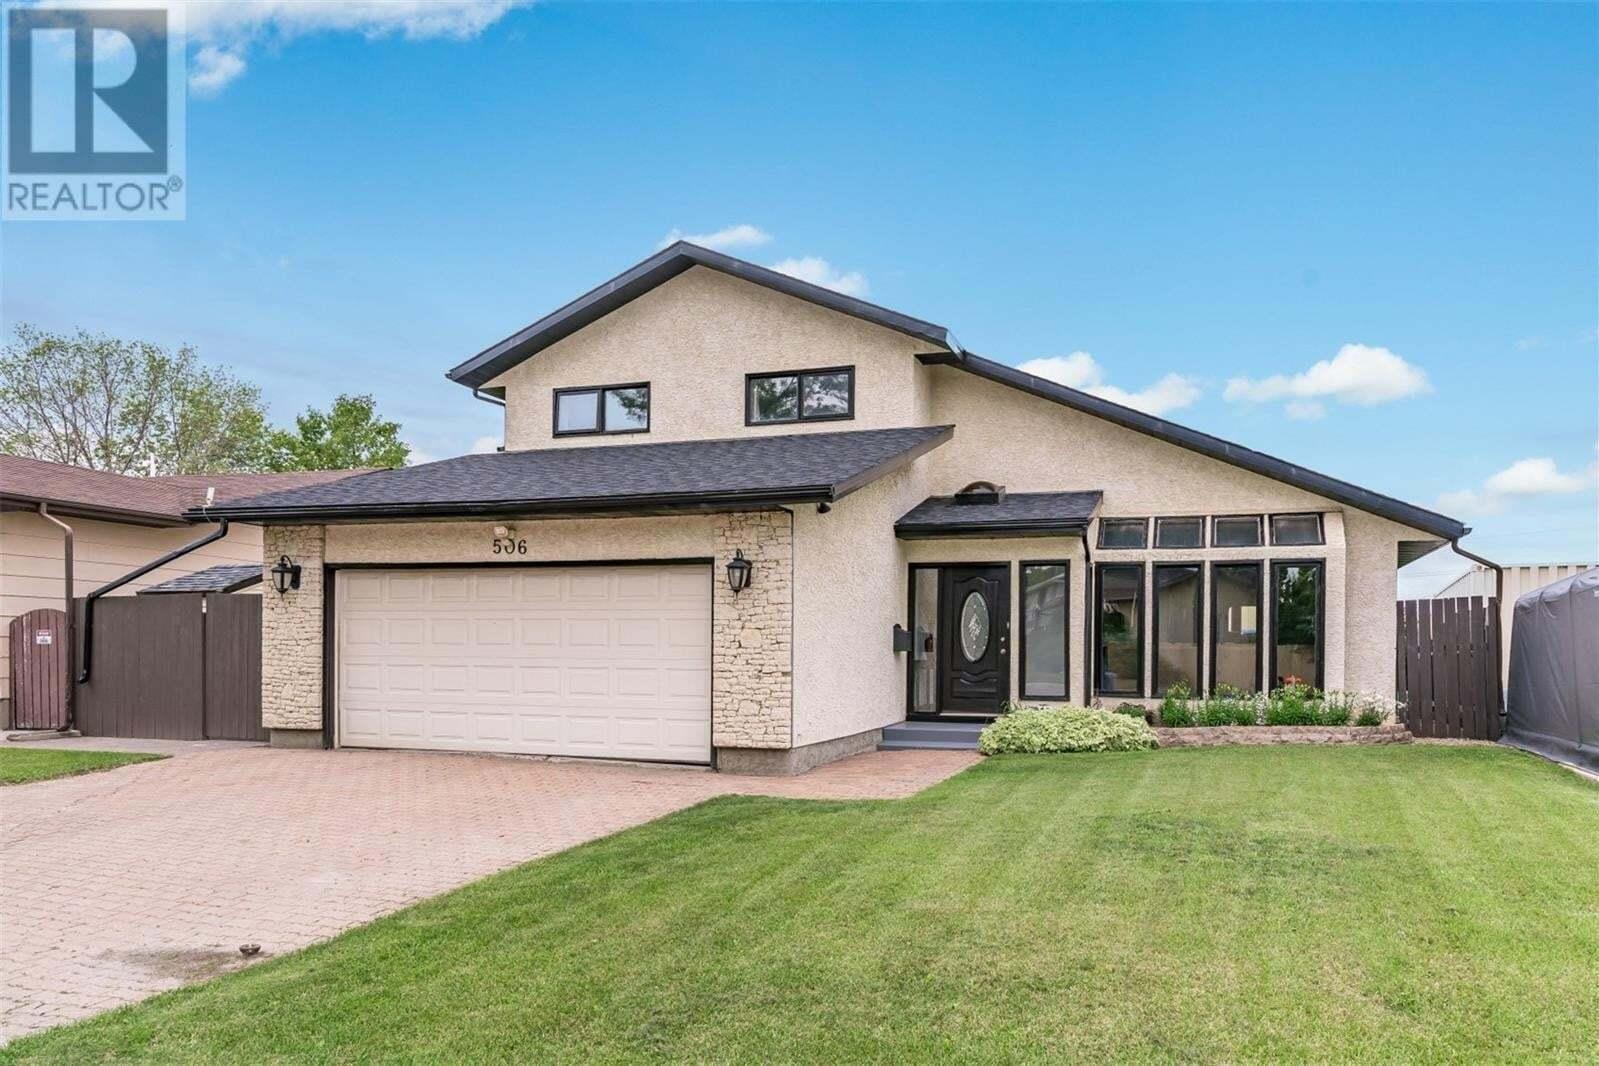 House for sale at 506 Delayen Cres Saskatoon Saskatchewan - MLS: SK817368